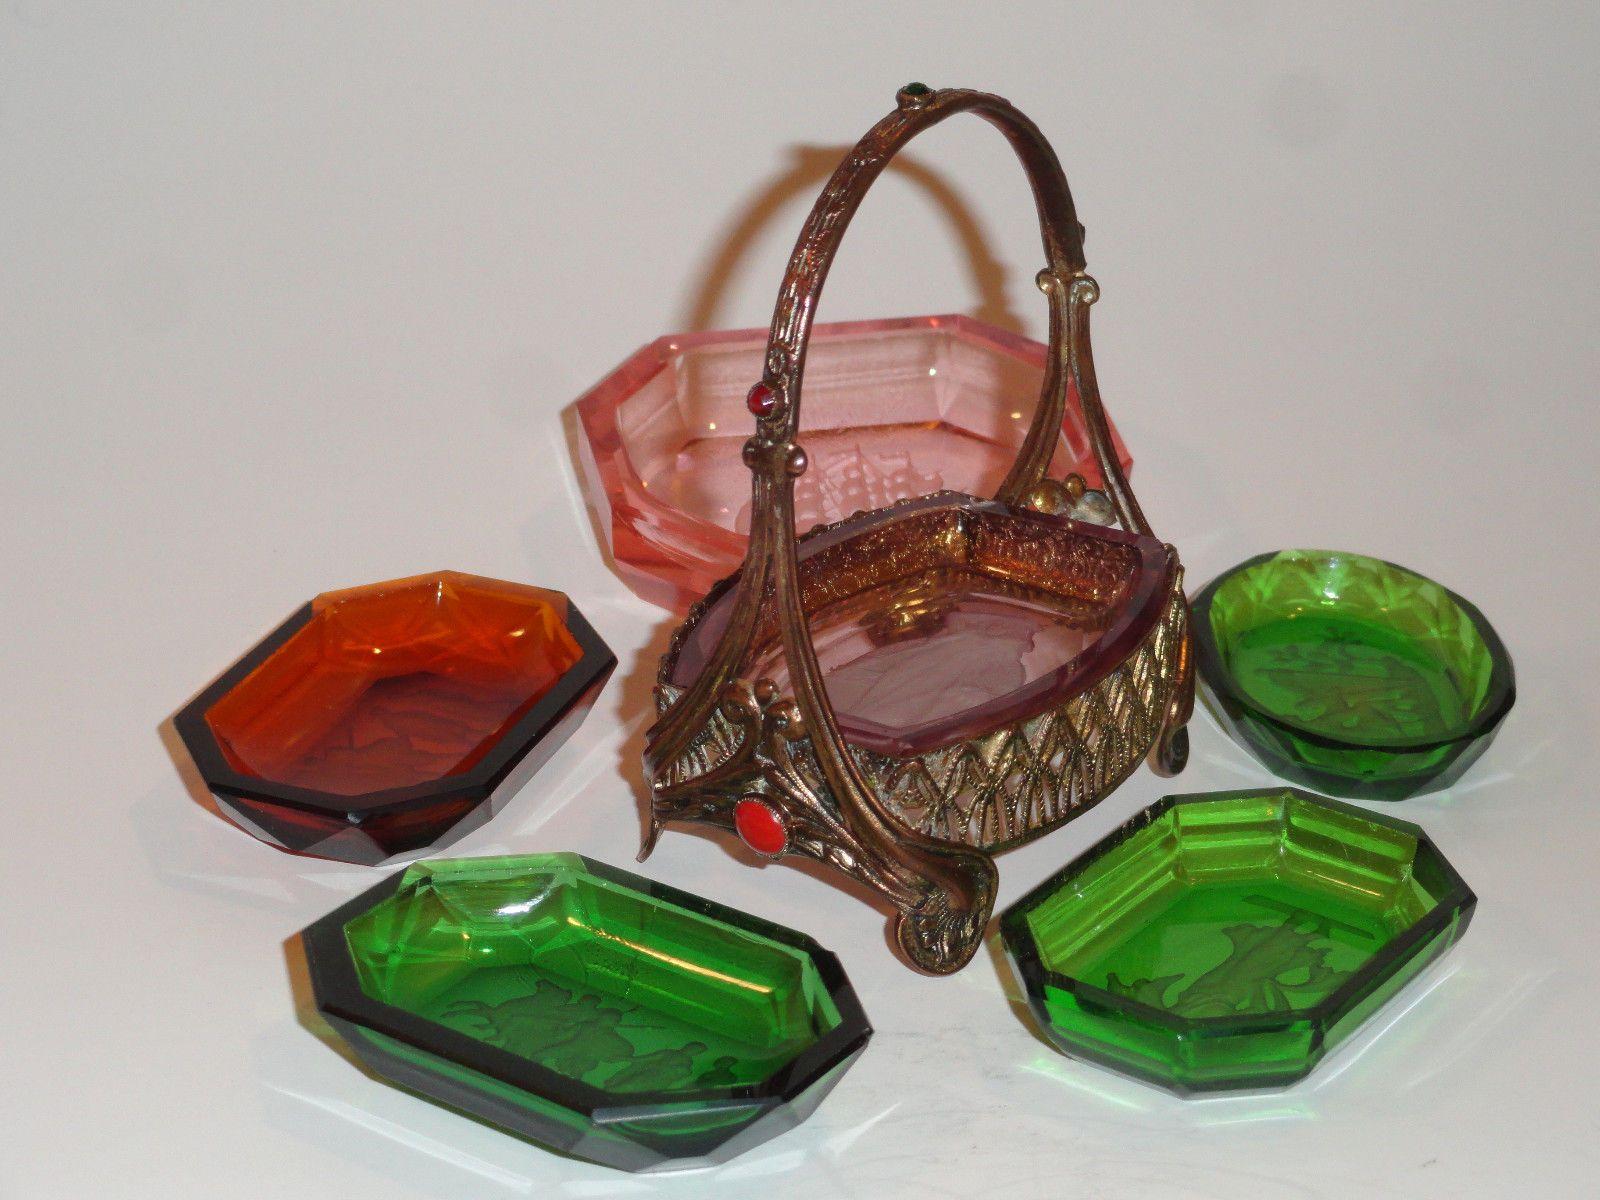 Vintage Glass Intaglio Trinket Pin Dish Tray Boy and Bird